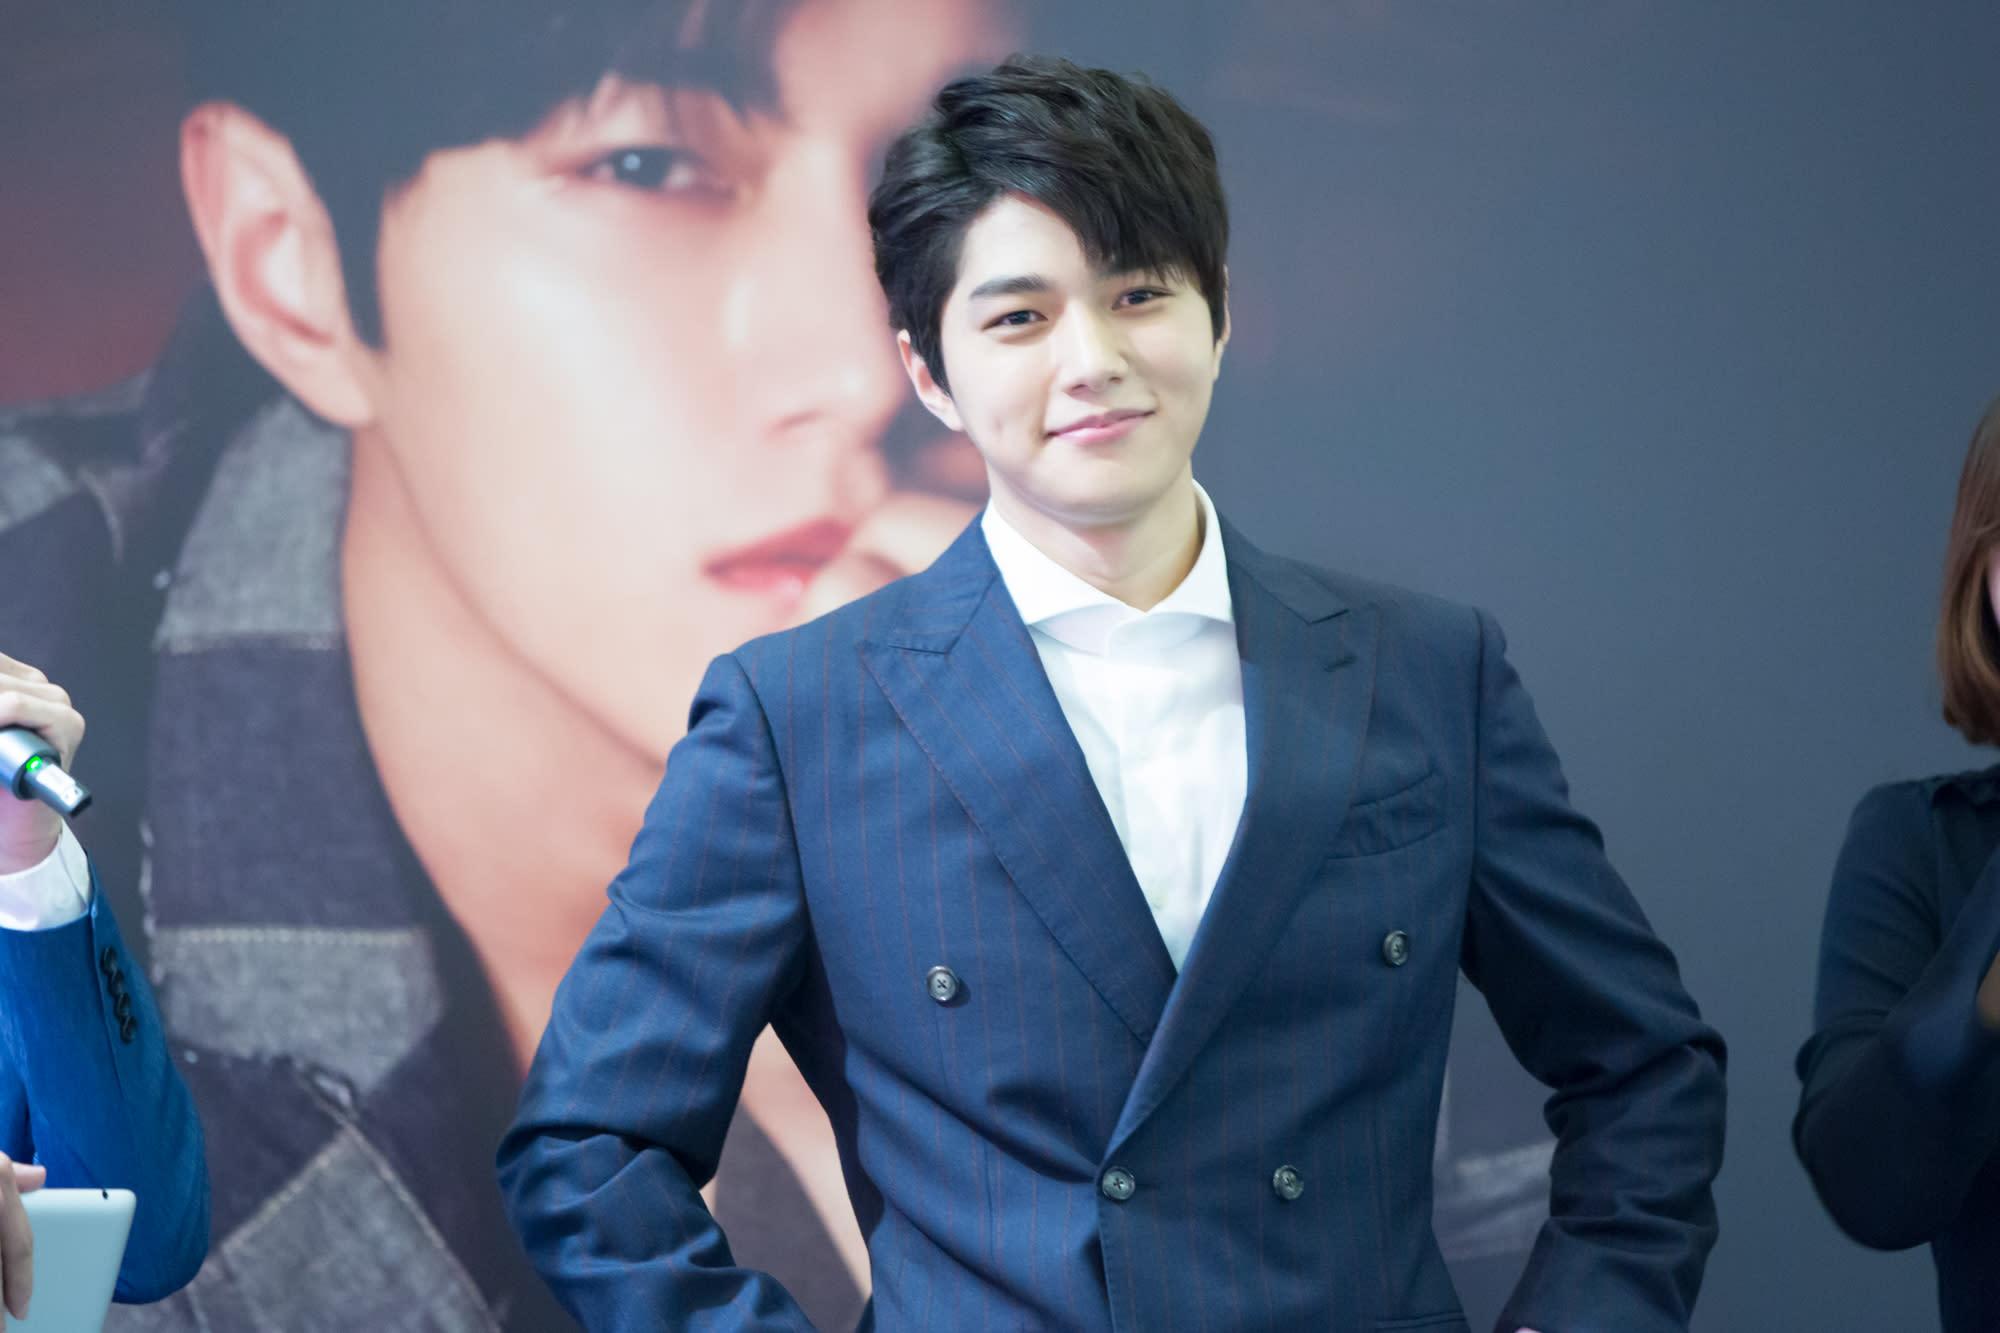 Myungsoo dating 2019